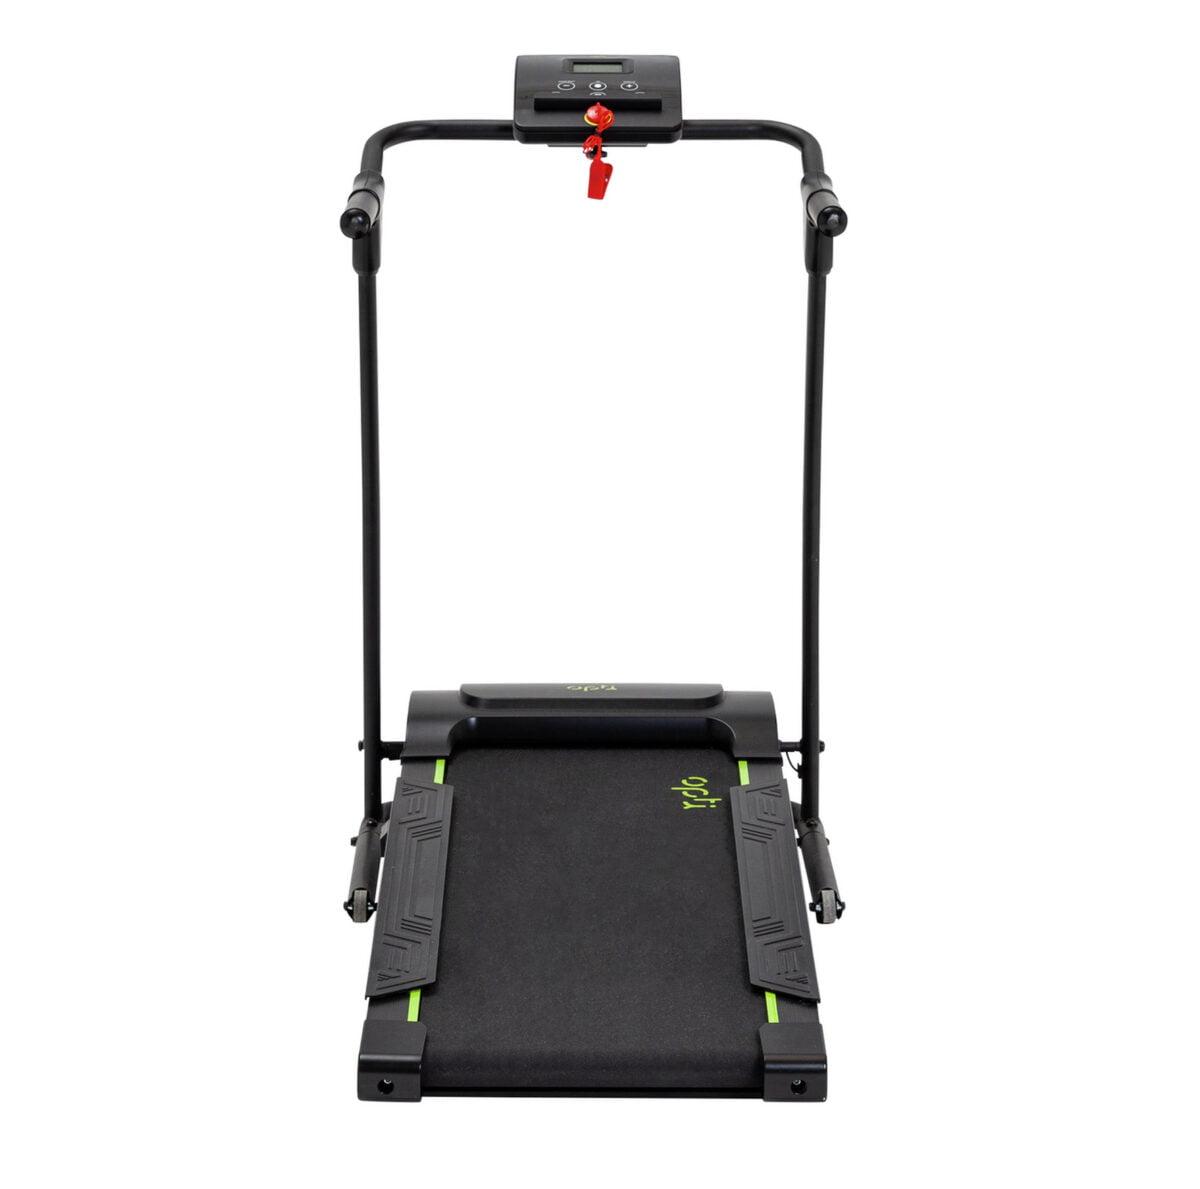 Opti Motorised Walking Treadmill running track in green and black